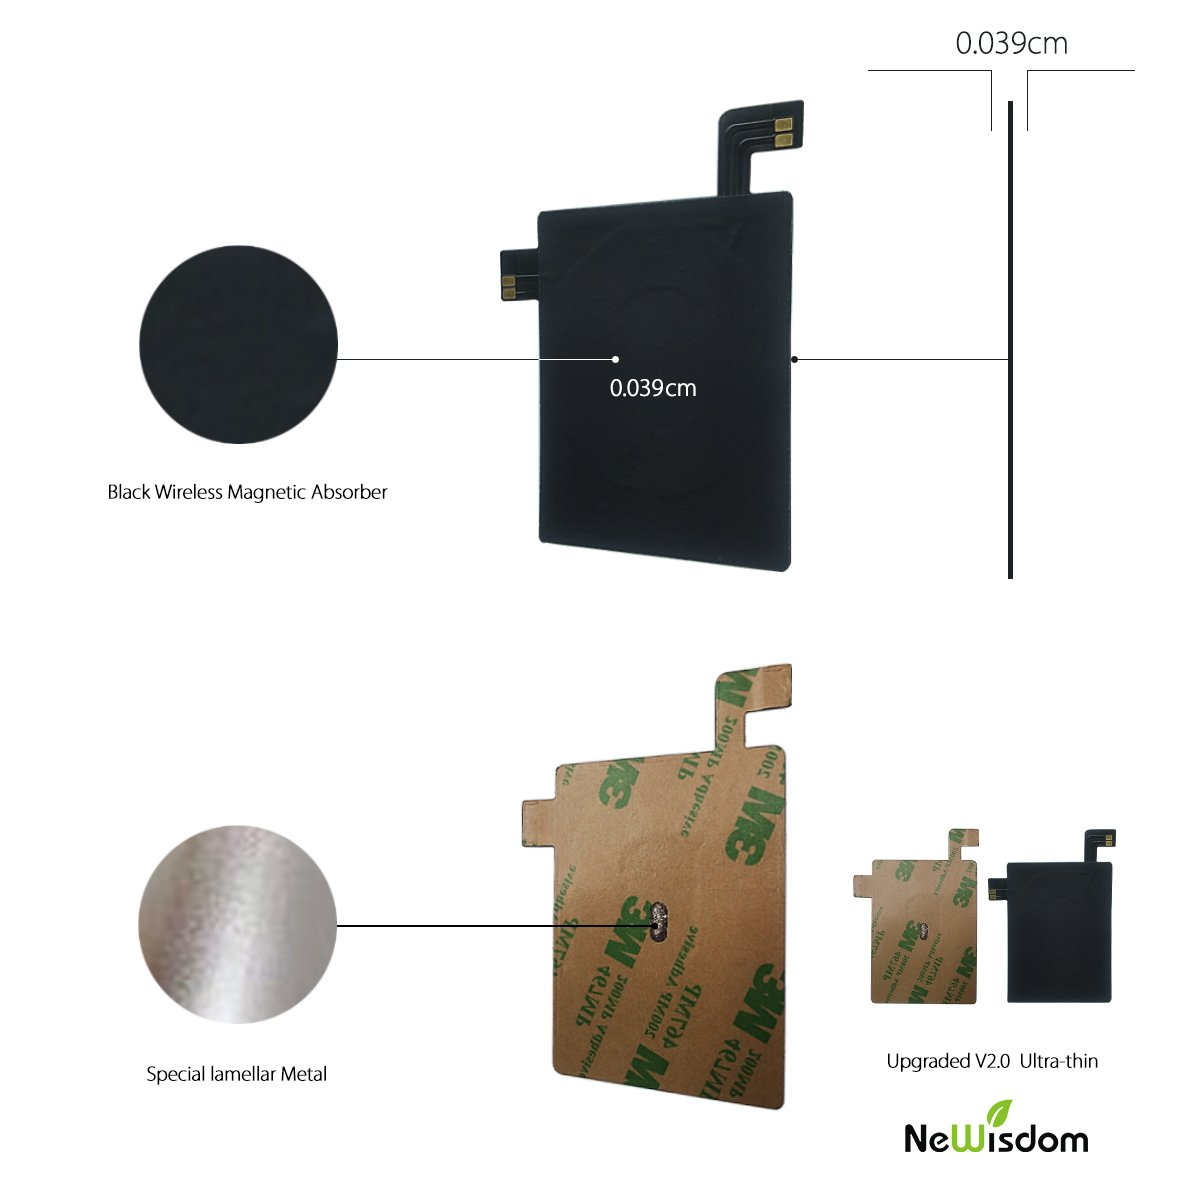 Amazon.com: NeWisdom [Upgraded V2.0 Ultra Slim]LG G4 Qi Wireless ...